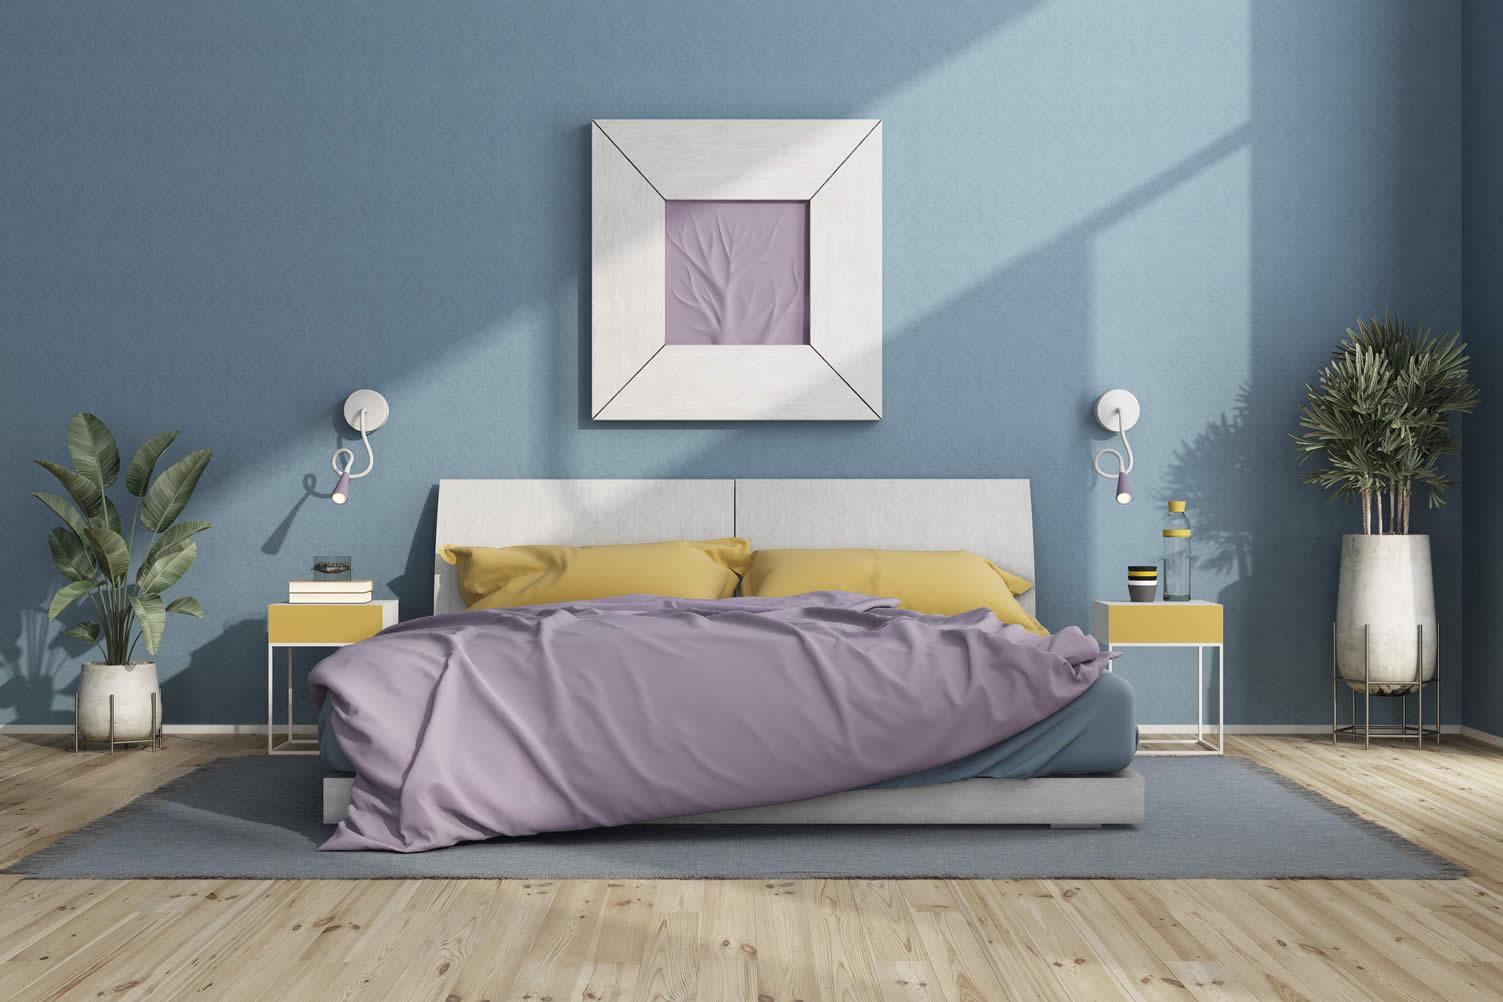 how to create a sense of home comfort